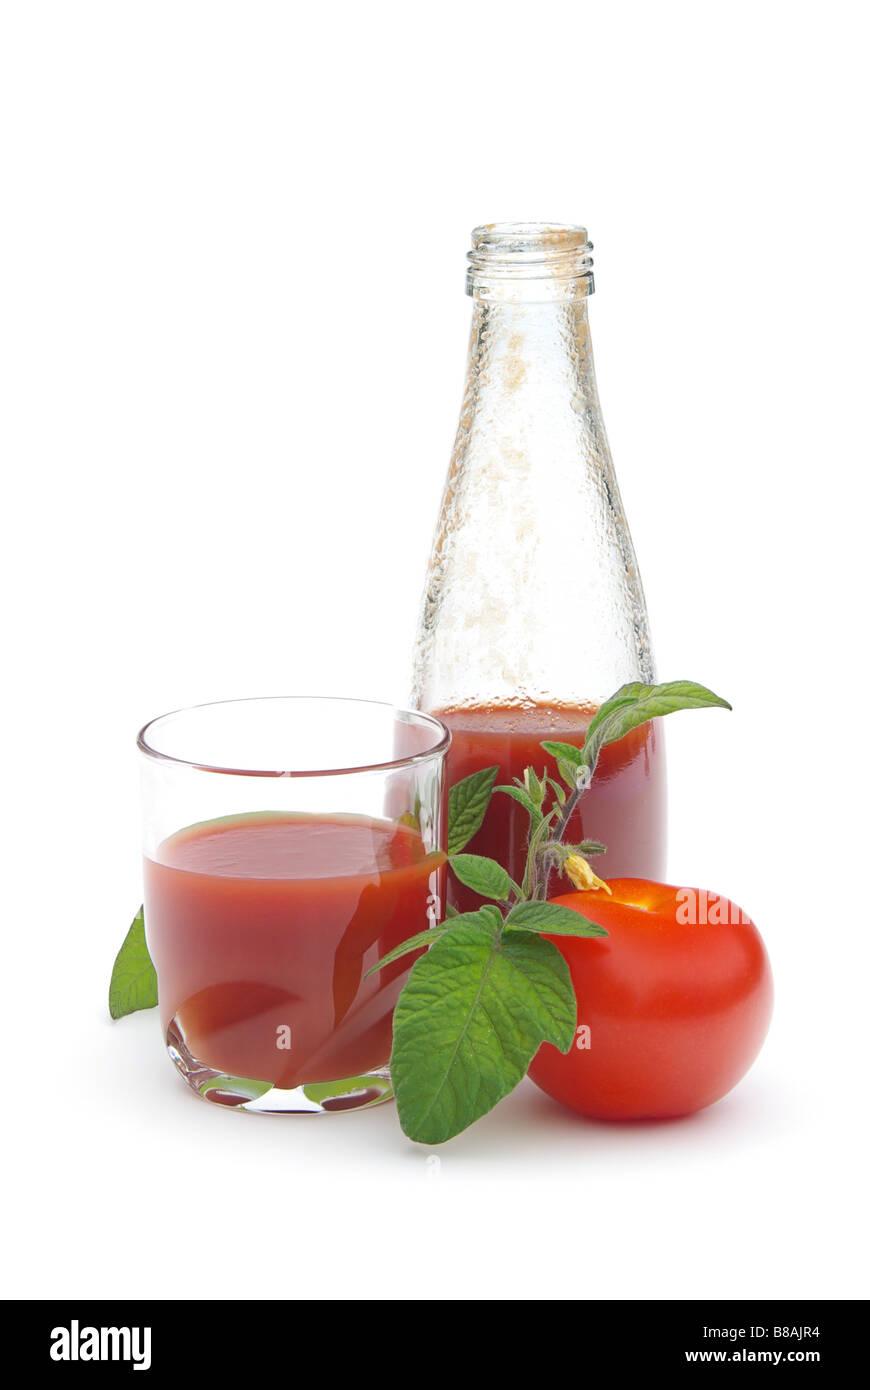 Tomatensaft tomato juice 04 - Stock Image